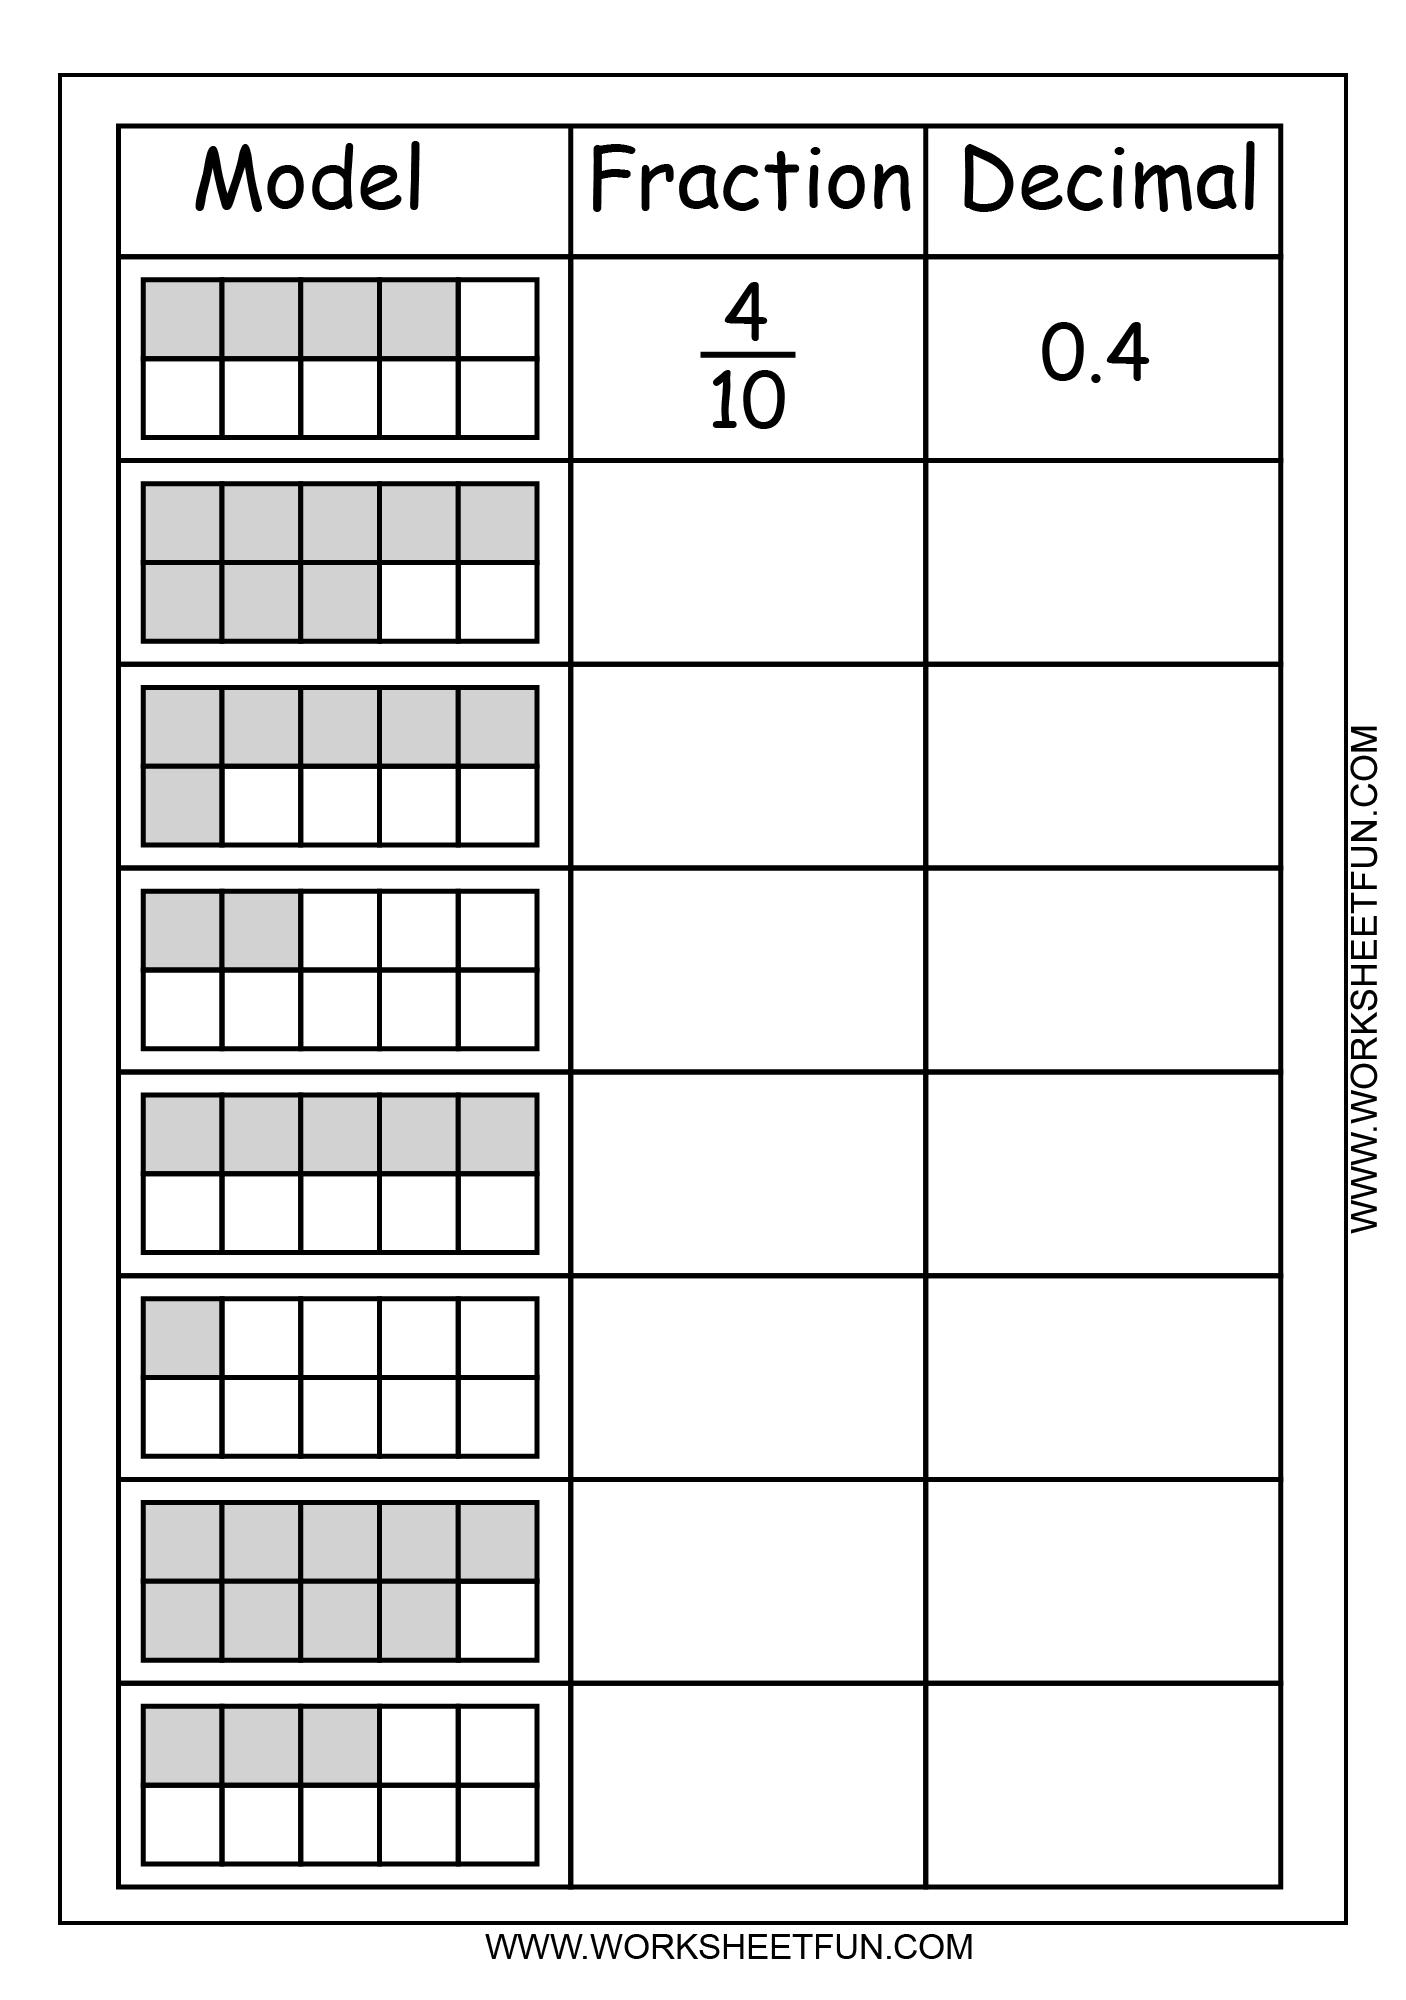 medium resolution of model-fraction-decimal-2.png 1